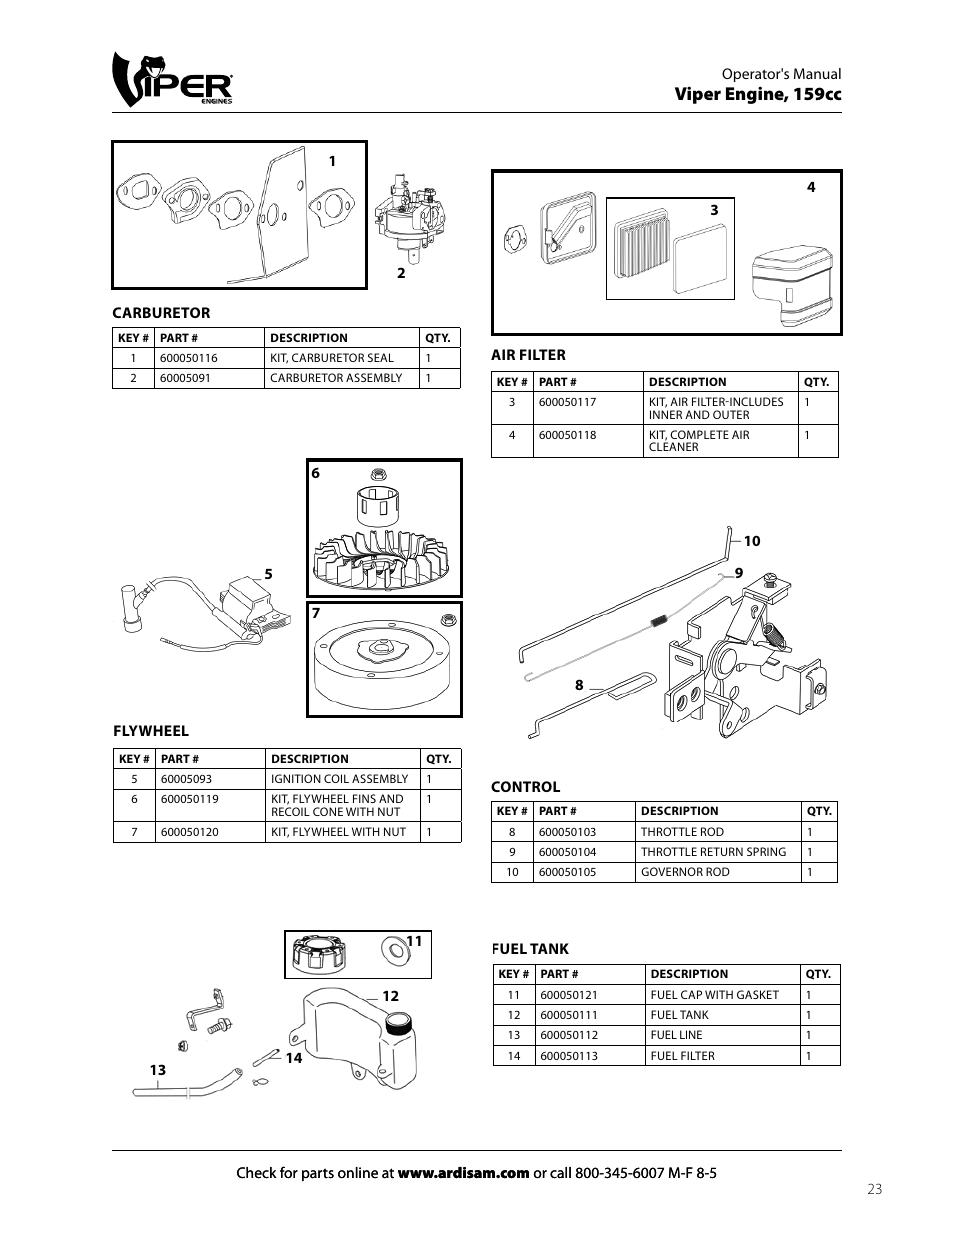 Viper engine, 159cc | EarthQuake 60005072 User Manual | Page 23 / 24